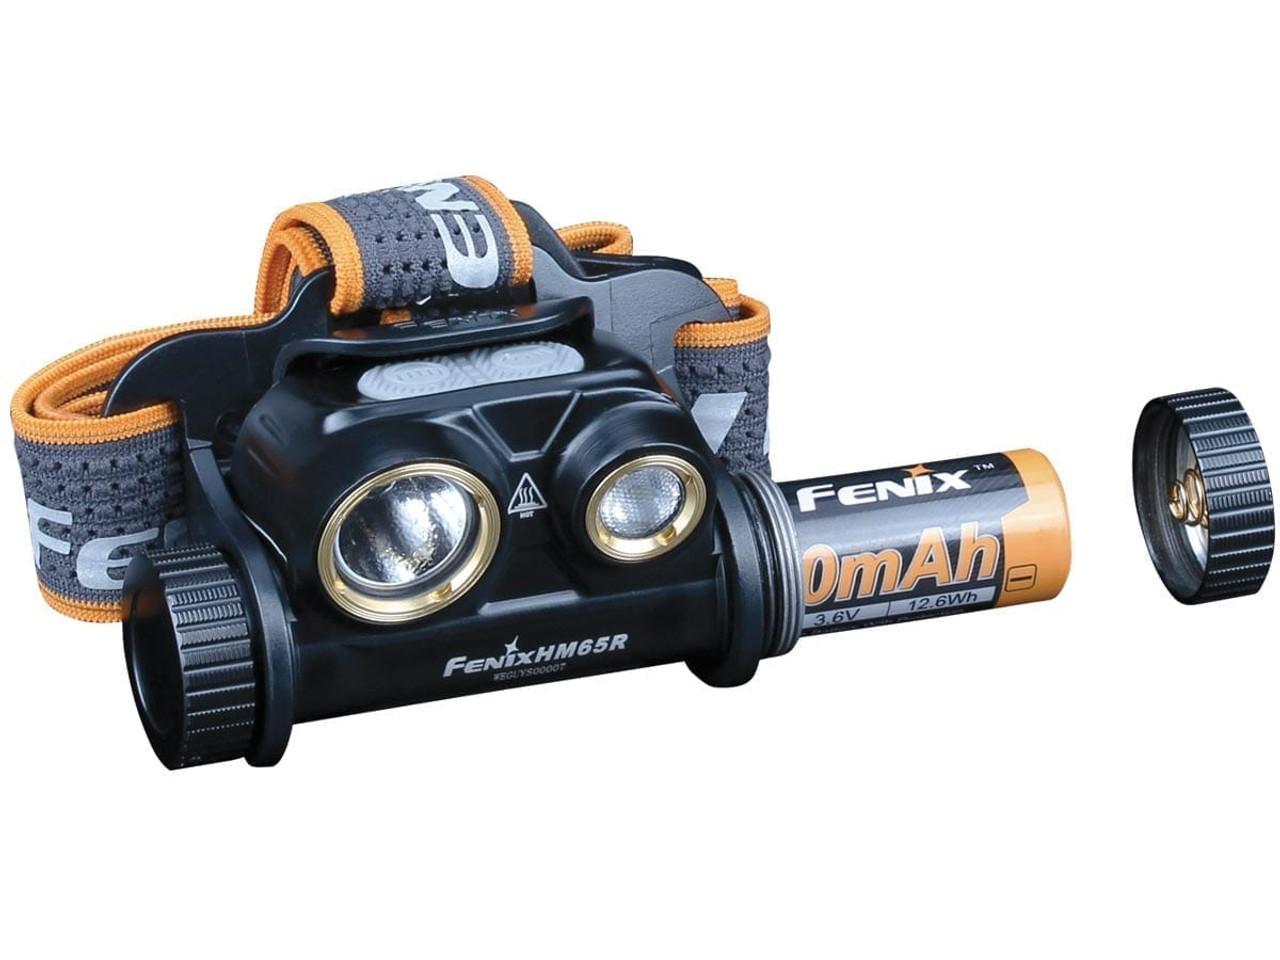 Fenix HM65R Black Rechargeable Trail Running Headlamp, 1500 Lumens